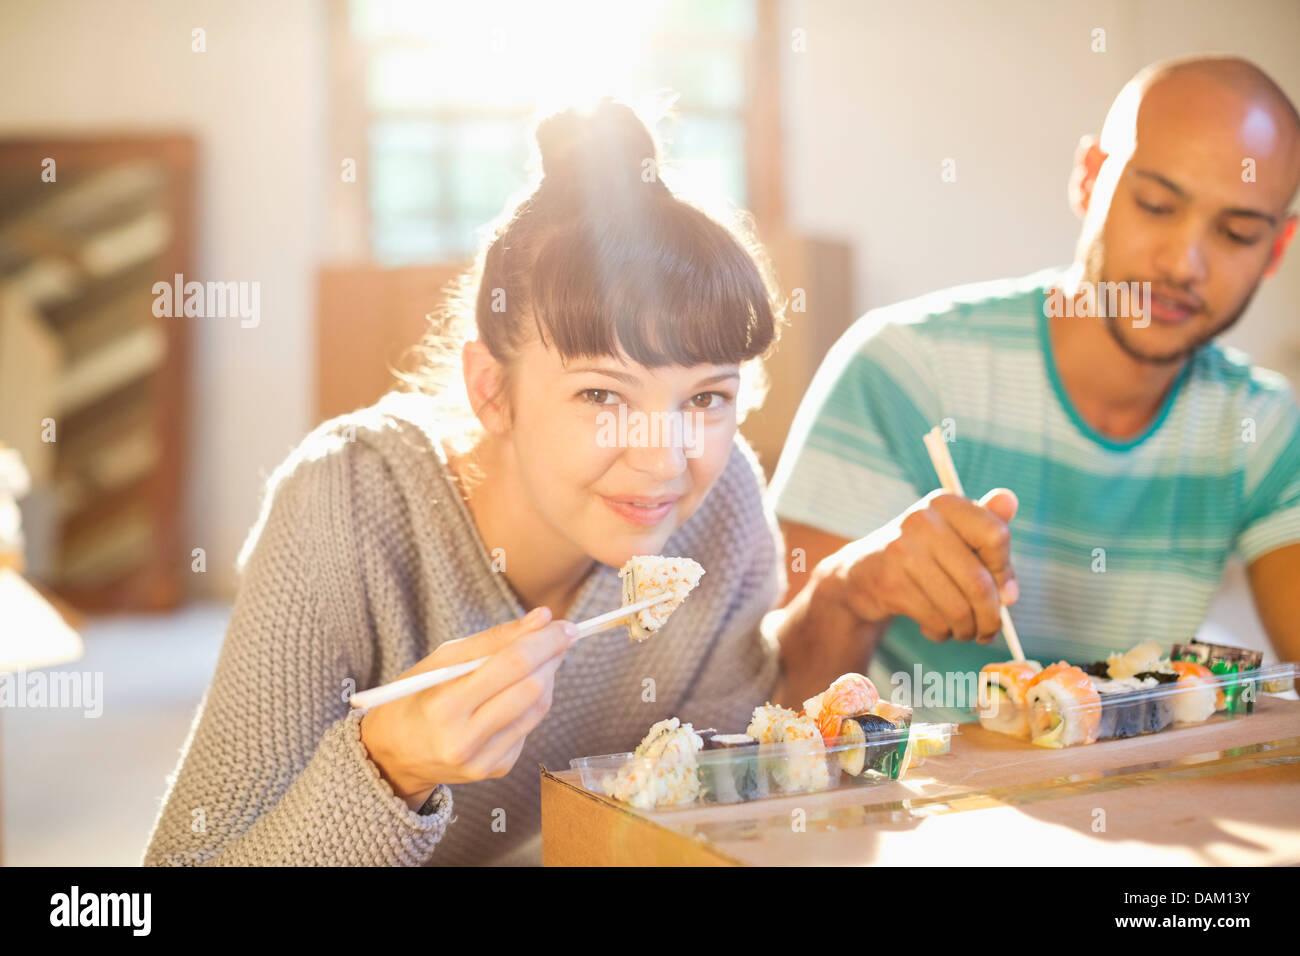 Par de comer sushi juntos Imagen De Stock